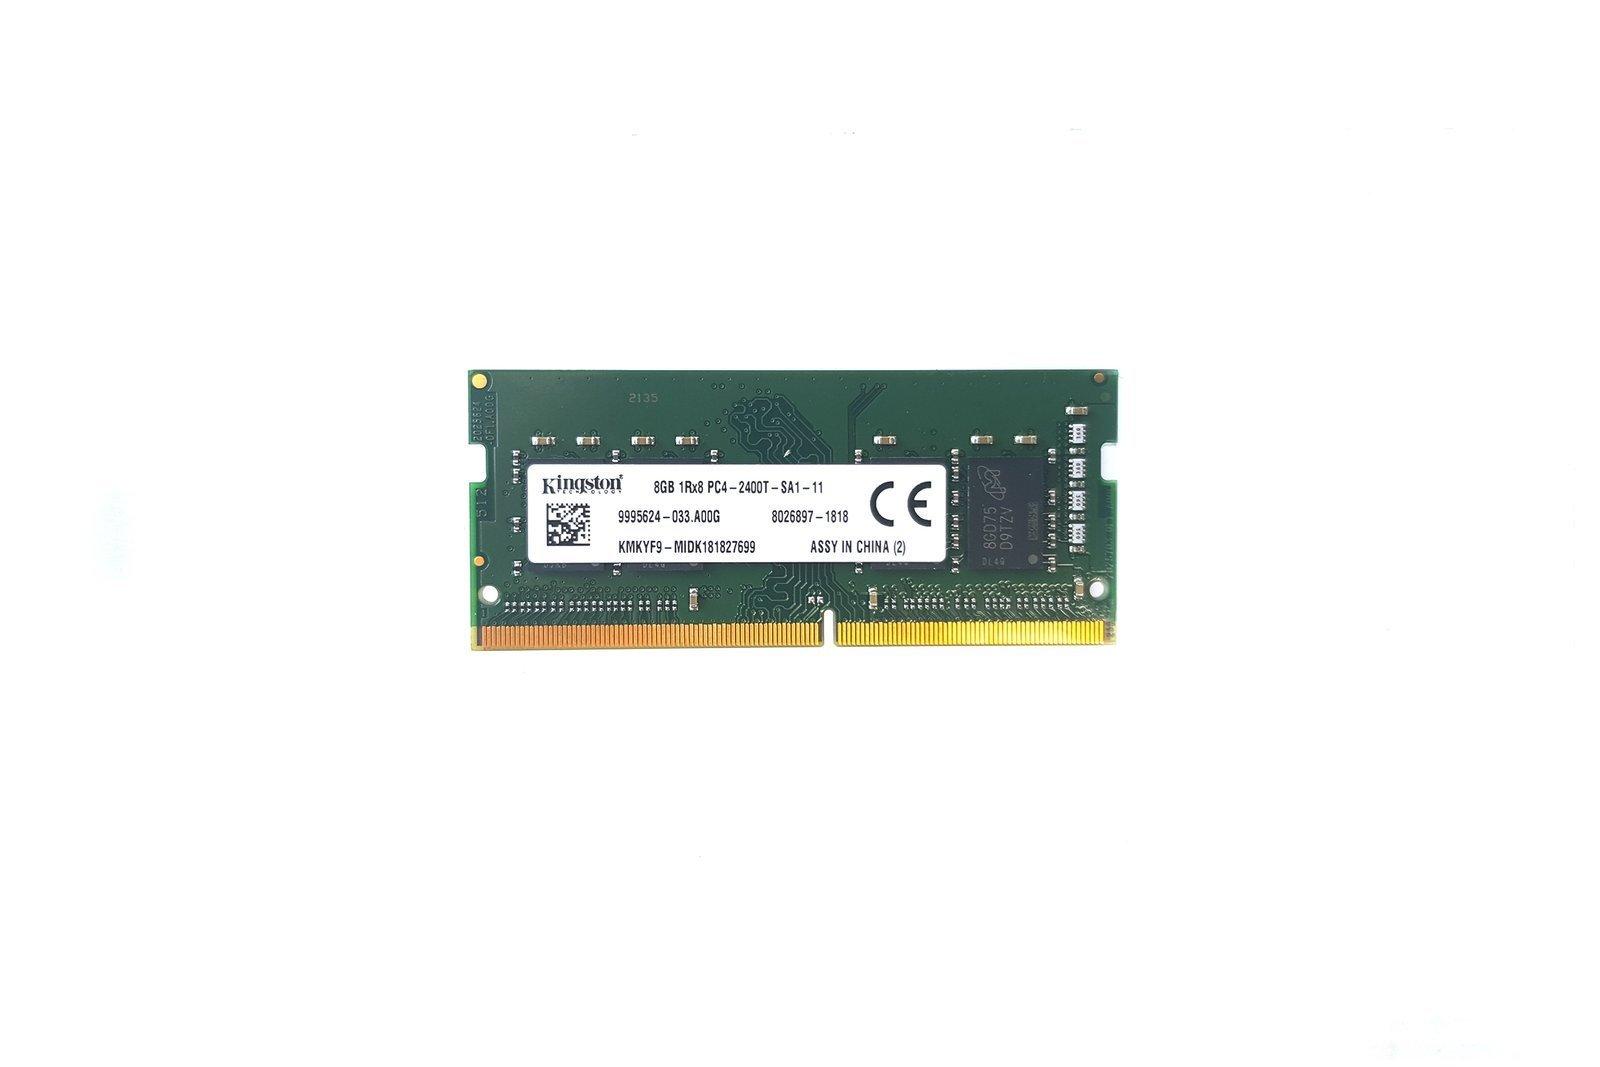 SODIMM Speicher RAM Kingston 8GB DDR4 KMKYF9-MIB